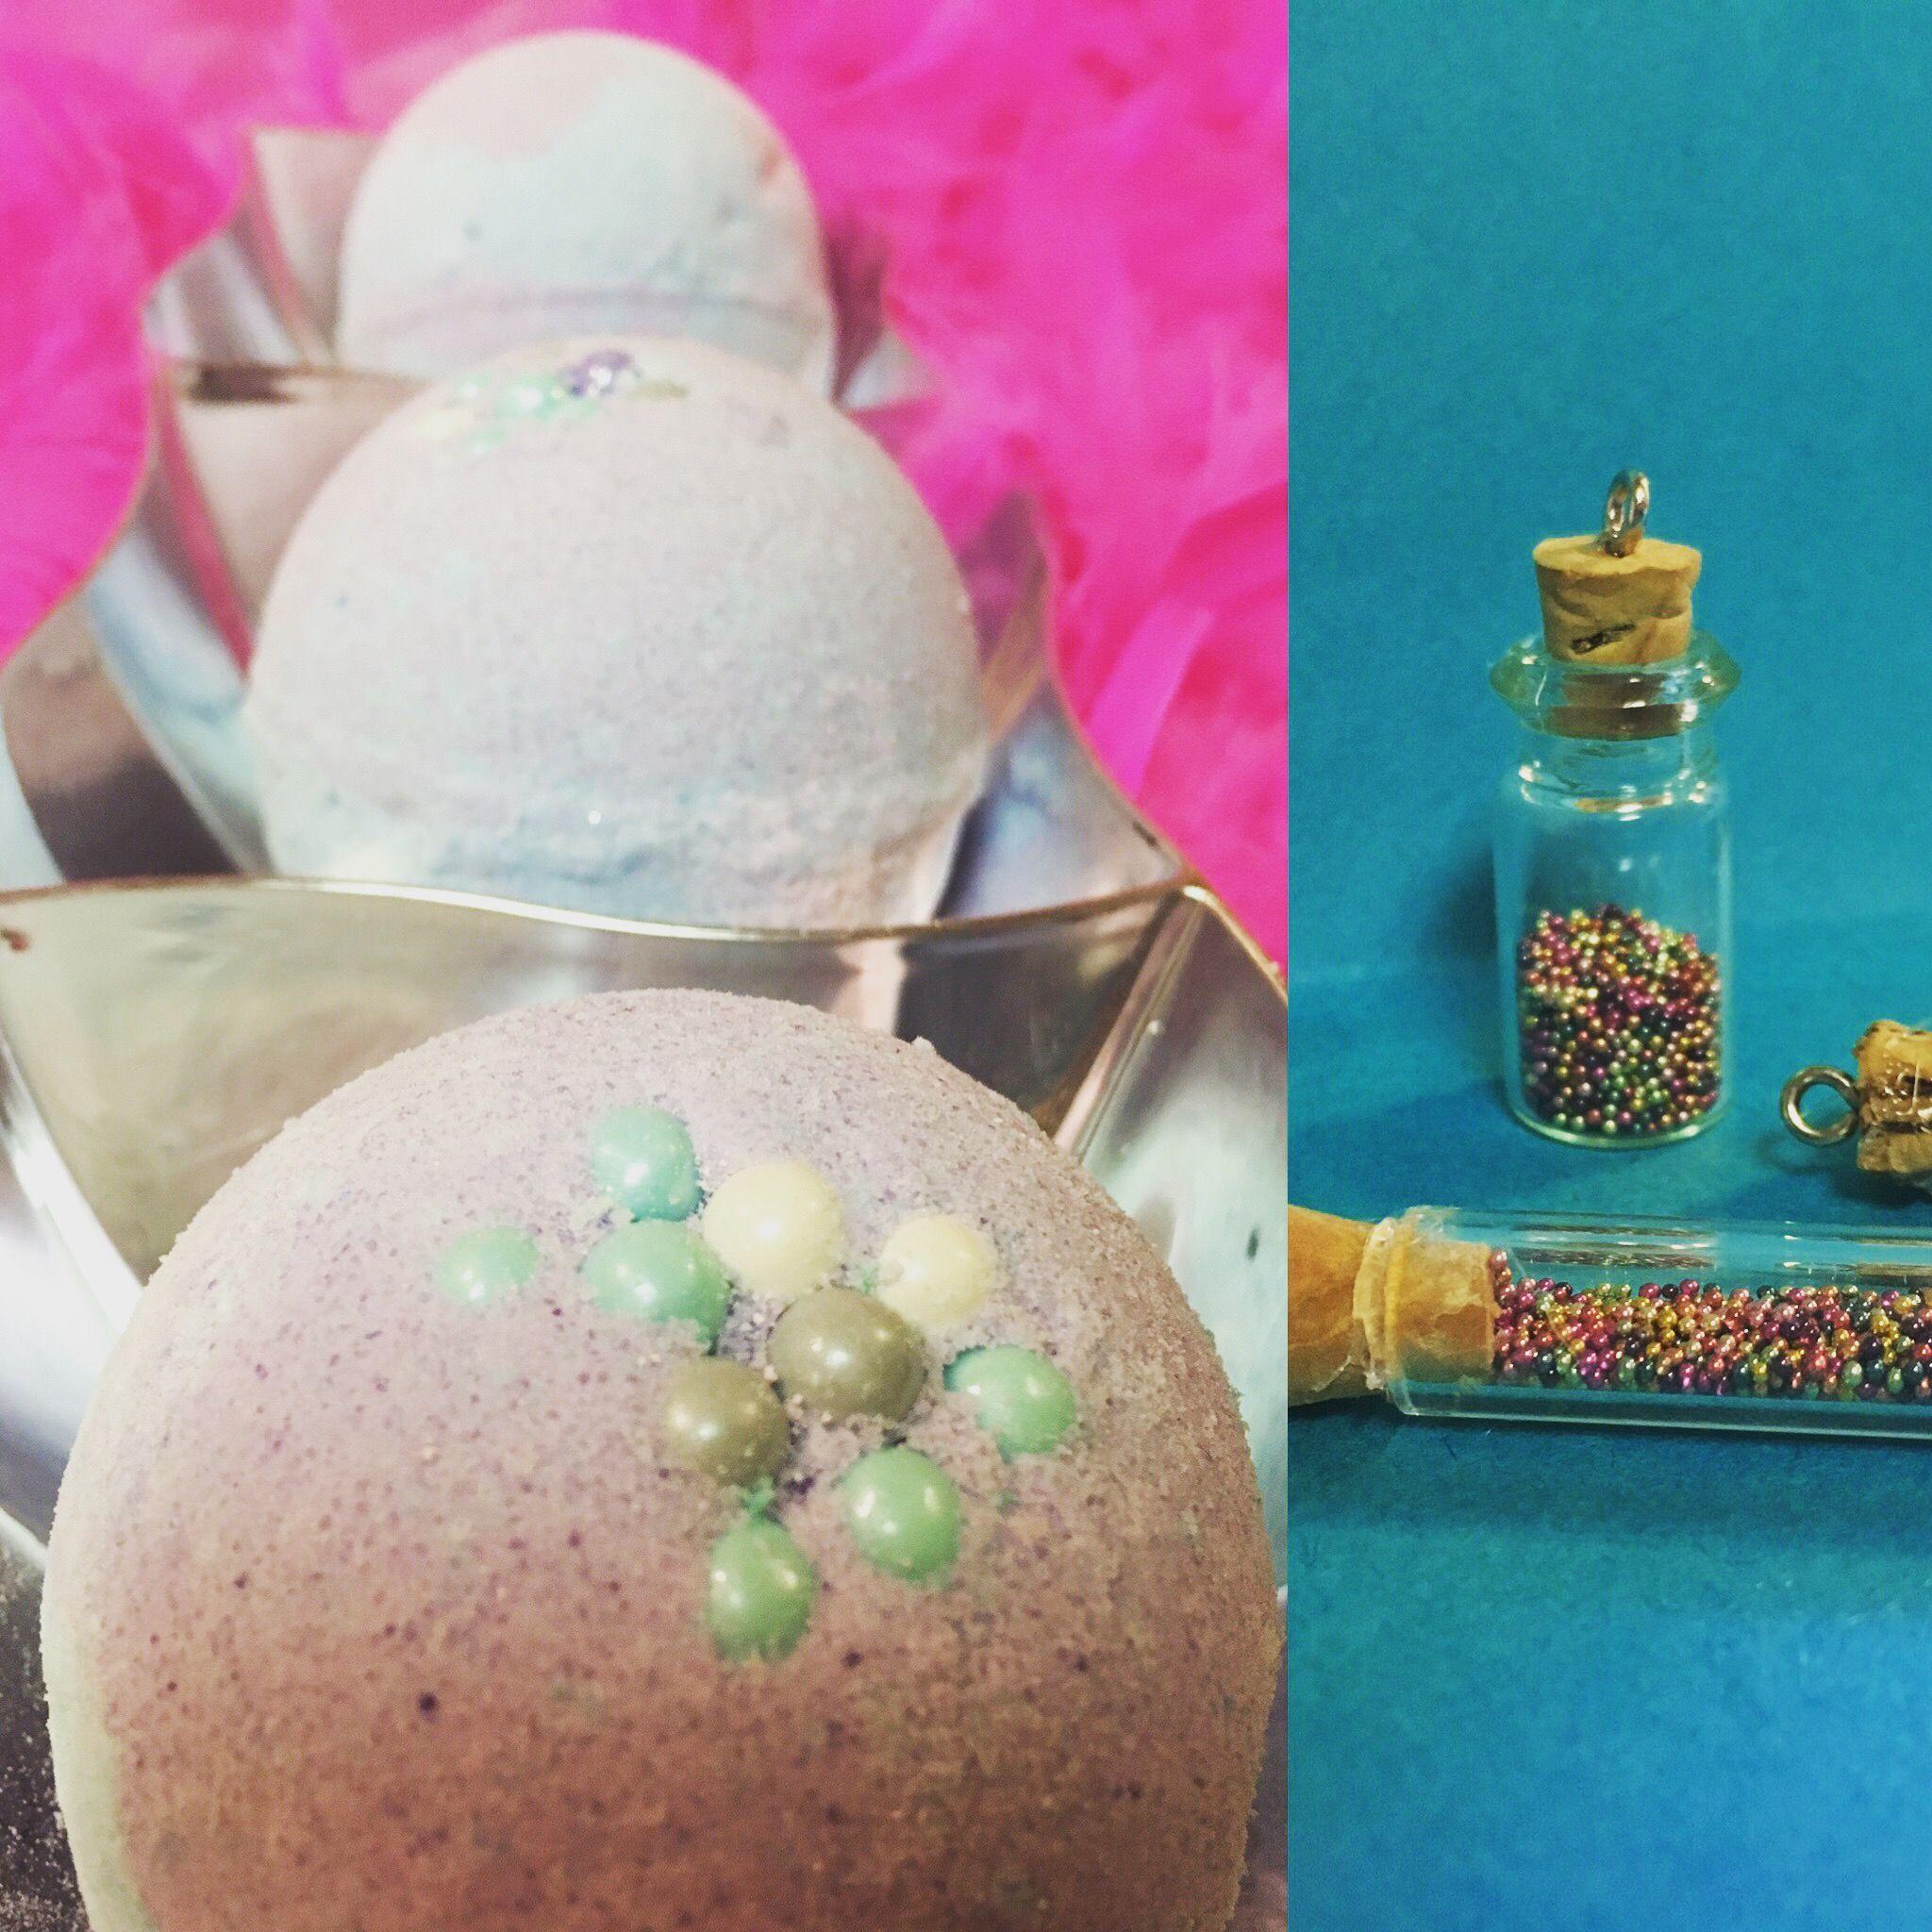 Bath bomb bath products bubble bars bubble bath bath